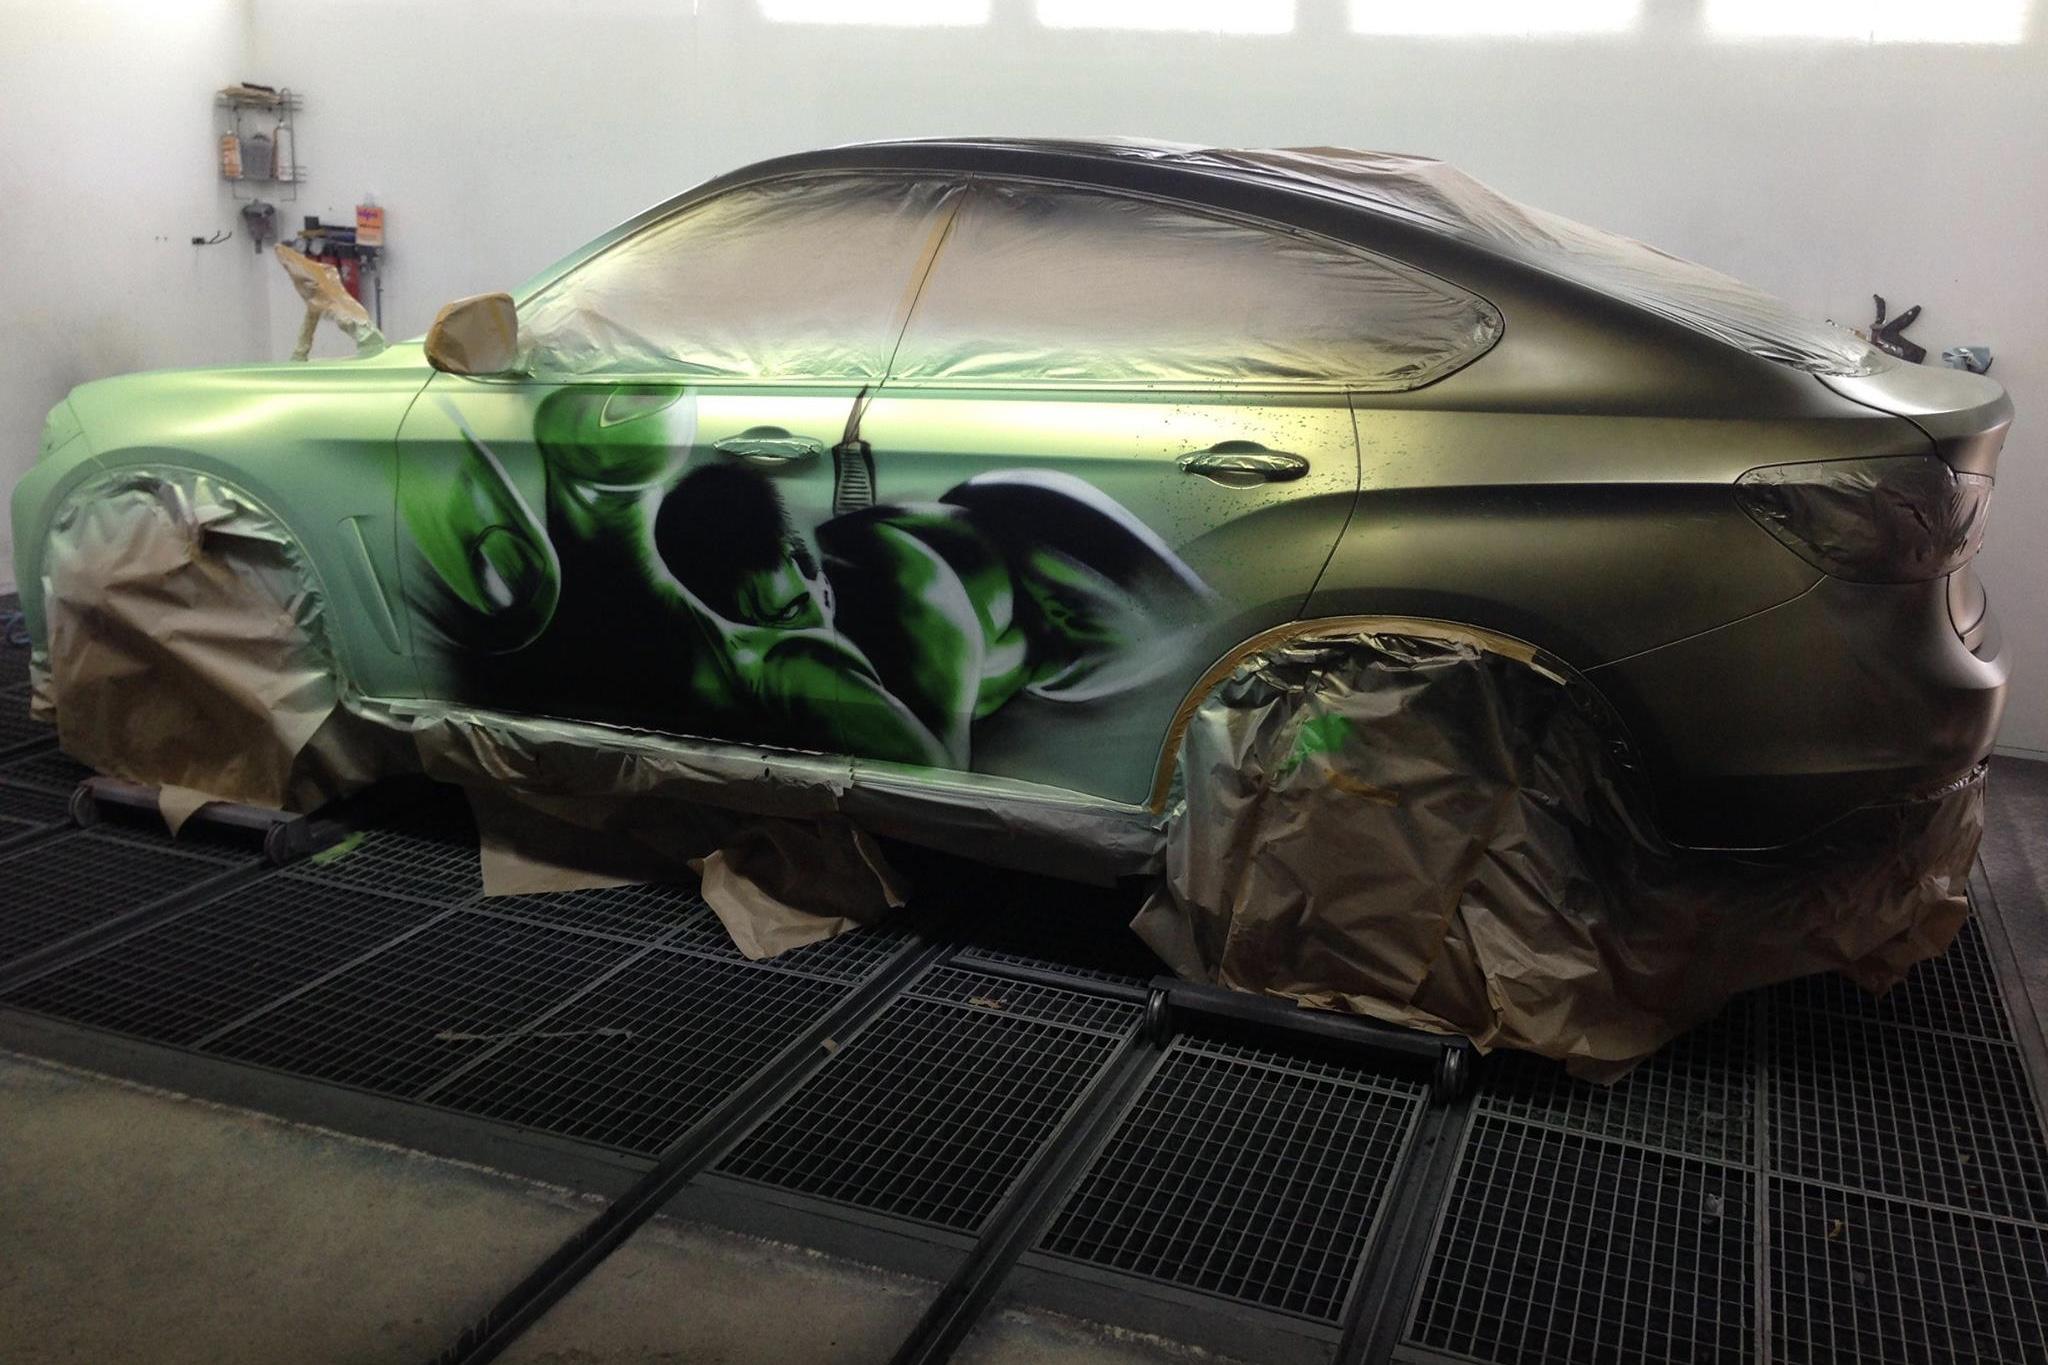 Video One Badass Supercar For Badass Super Villains Image 9